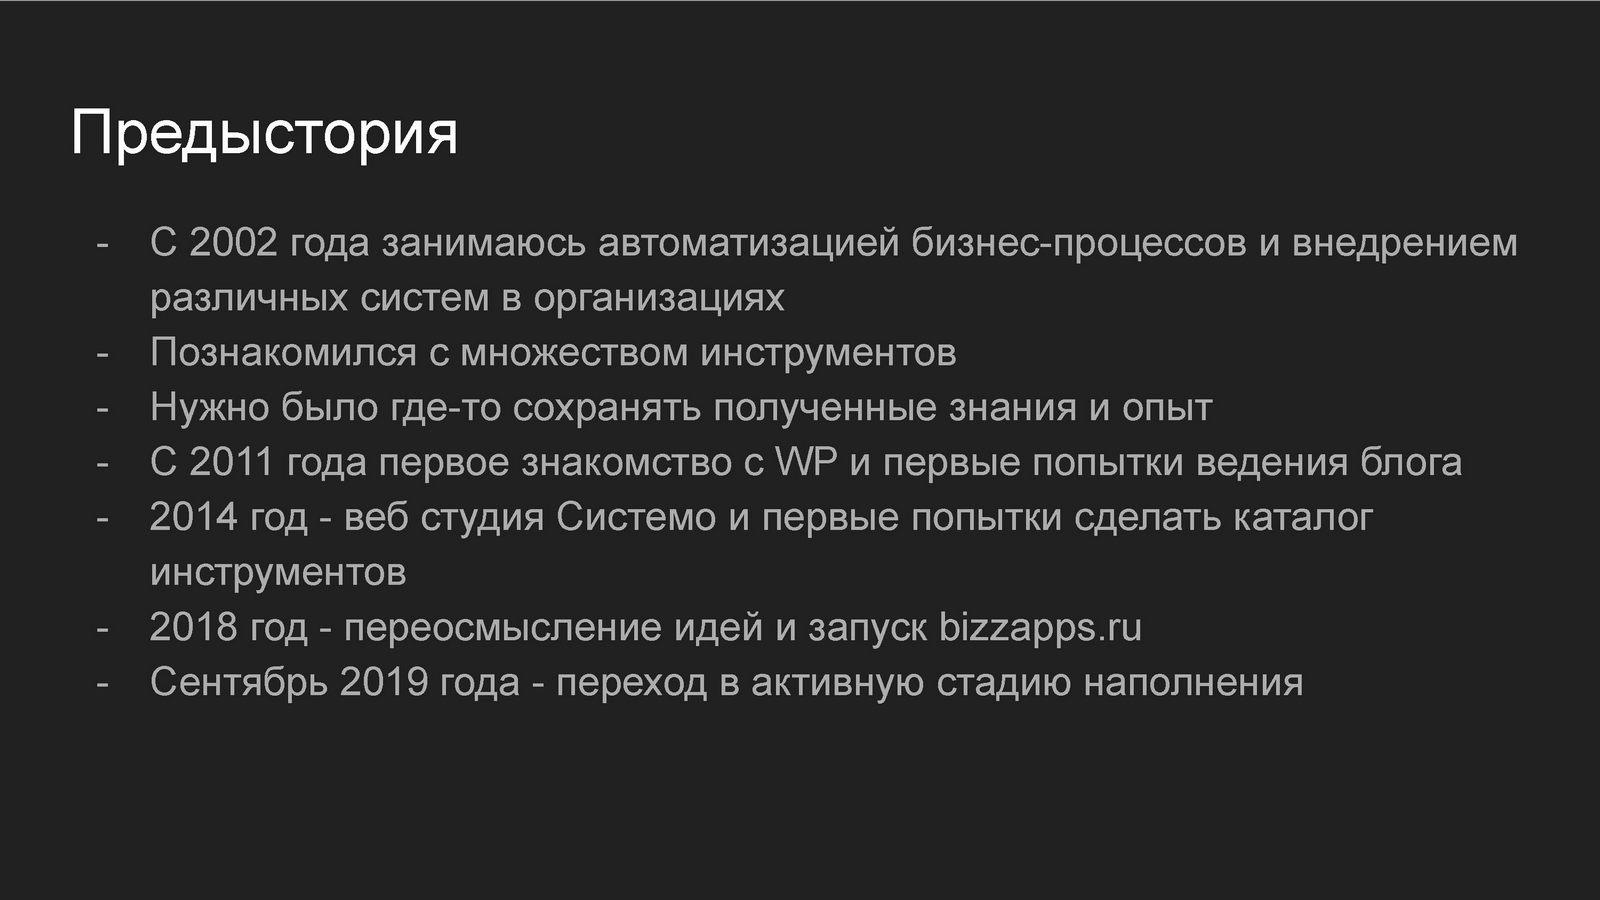 wp10-Анатолий Юмашев-Агрегатор bizzapps.ru 02